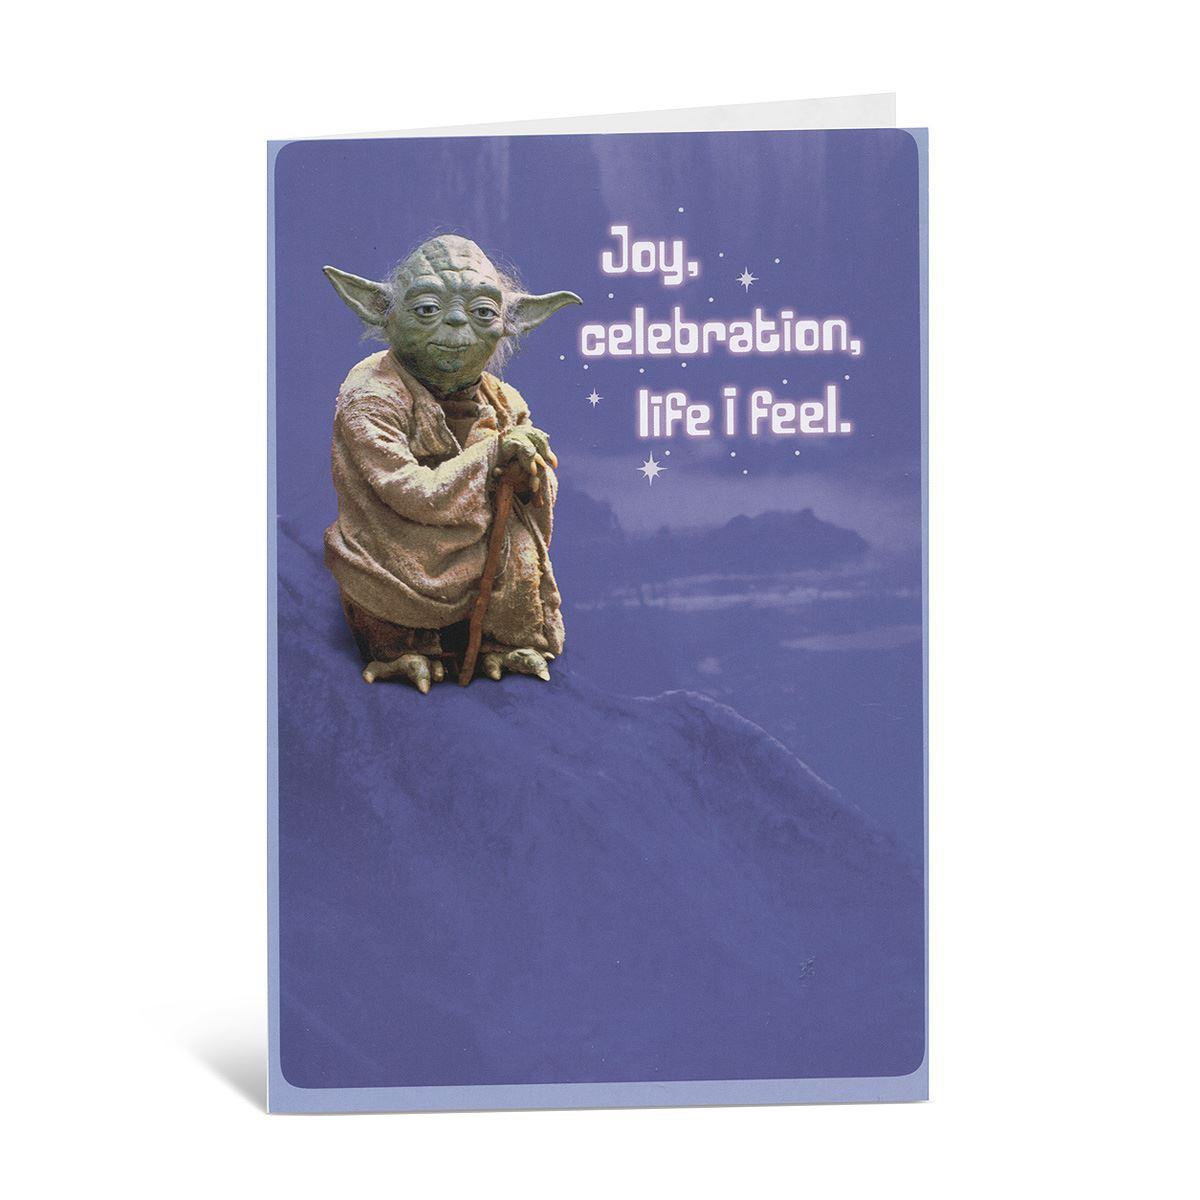 Tarjeta star wars yoda en fondo azul Libro - Sanborns